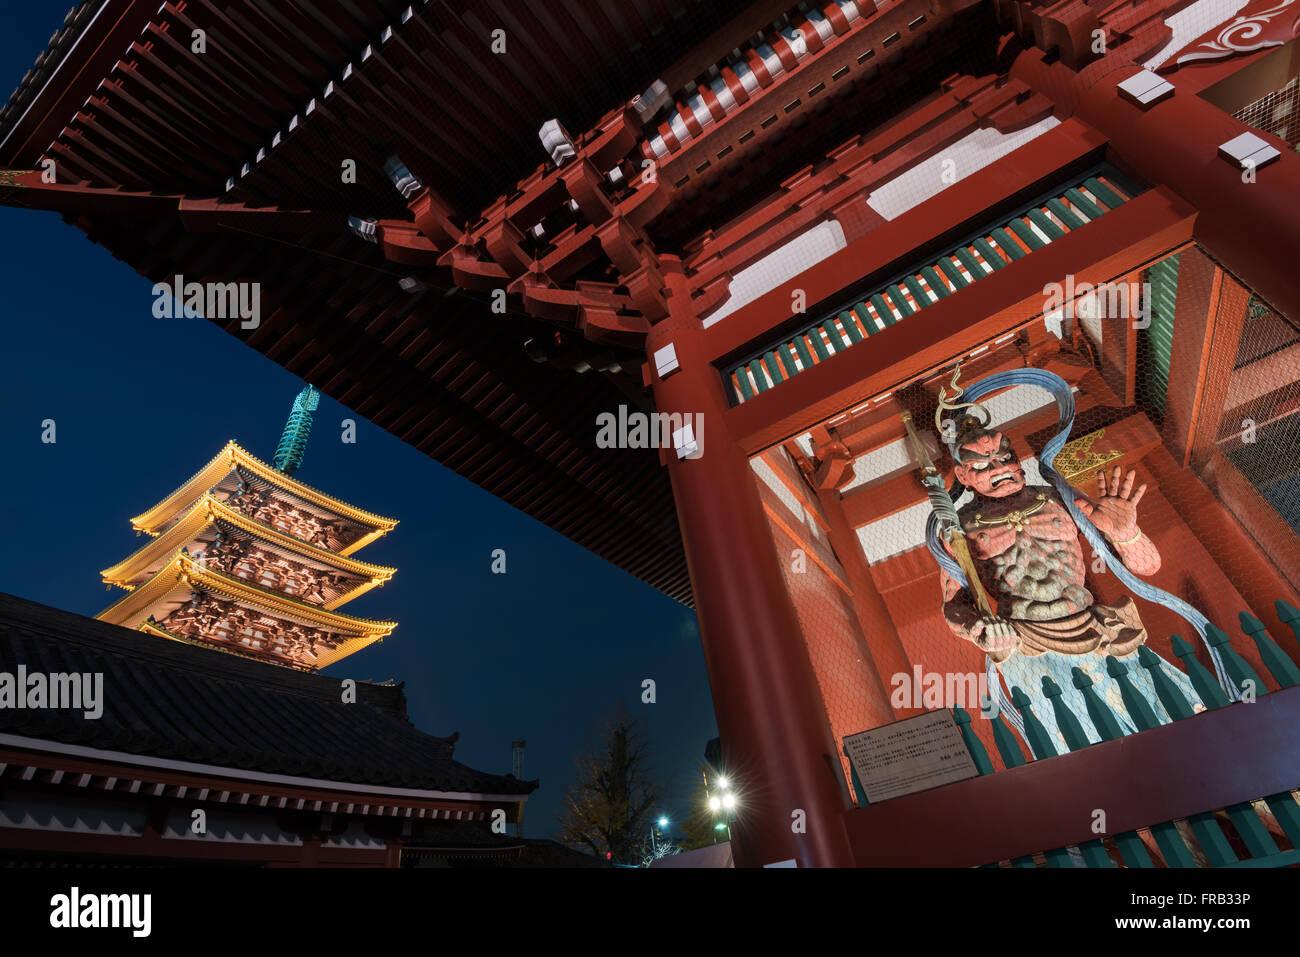 Tokyo, Japan - December 16, 2015: The Five-storied Pagoda of Senso-ji Temple in Asakusa , Tokyo. - Stock Image